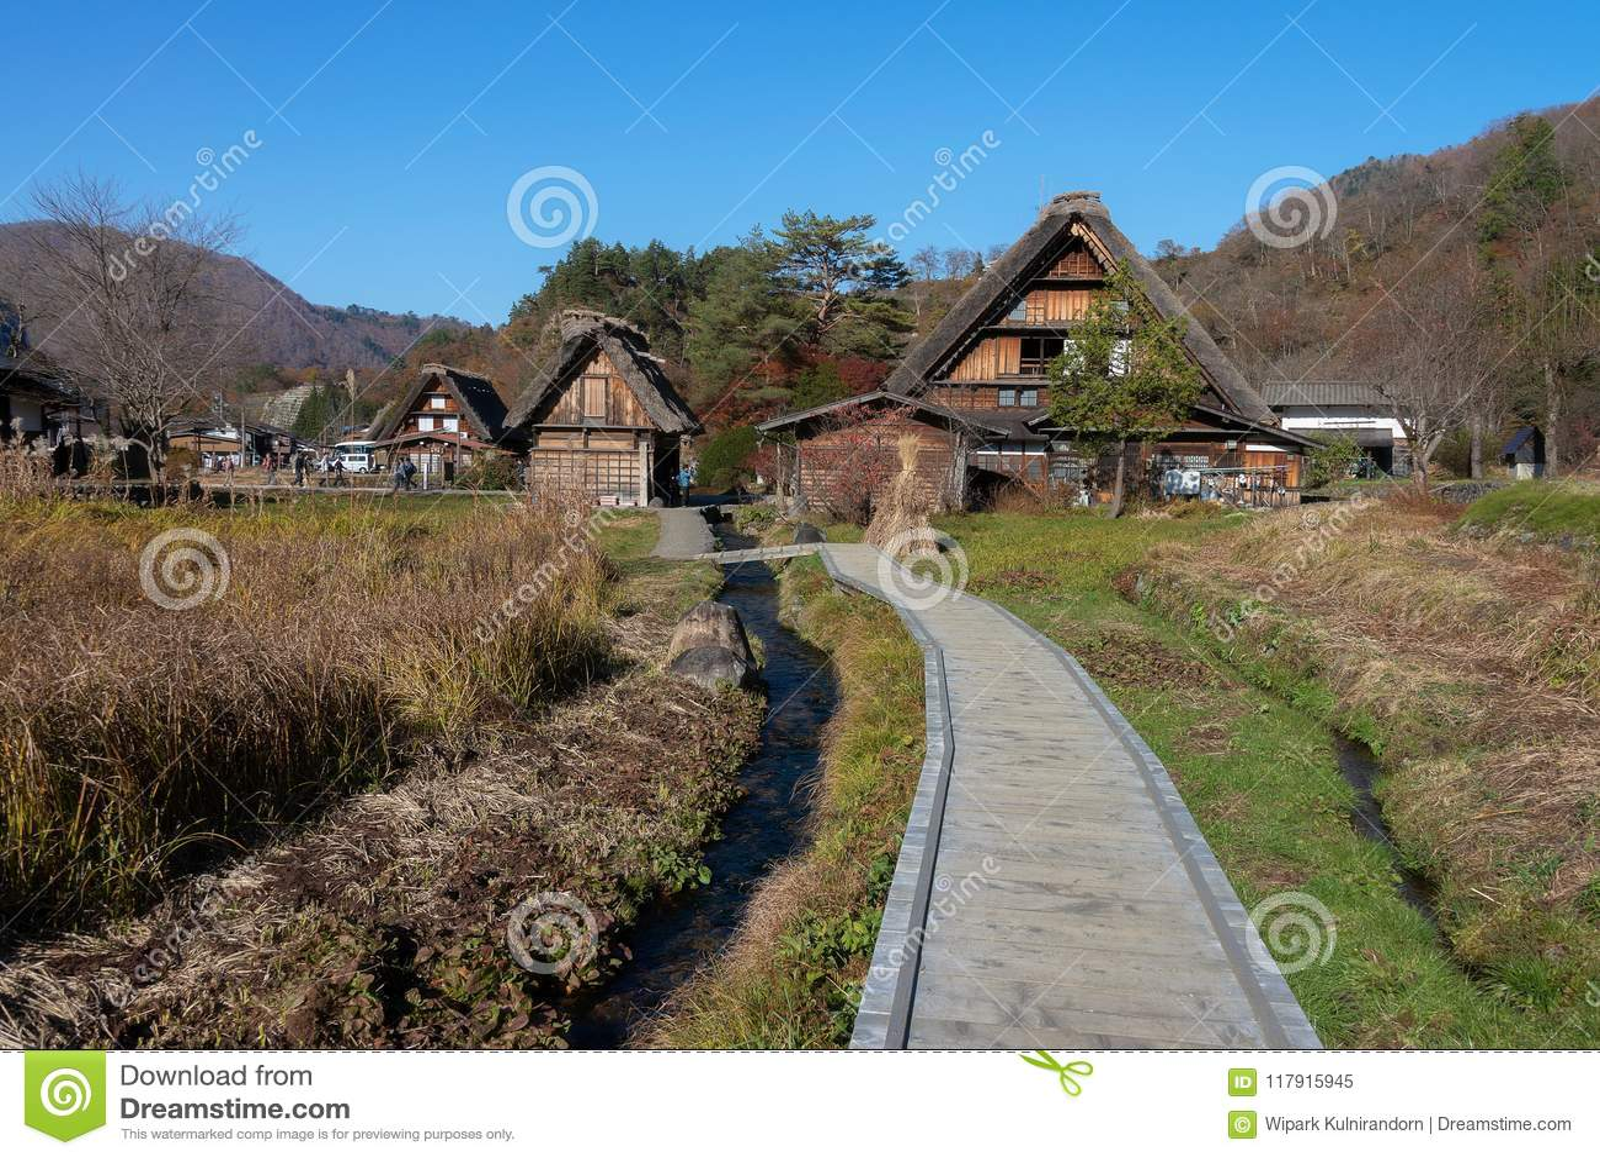 Shirakawago , beautiful village in the valley.